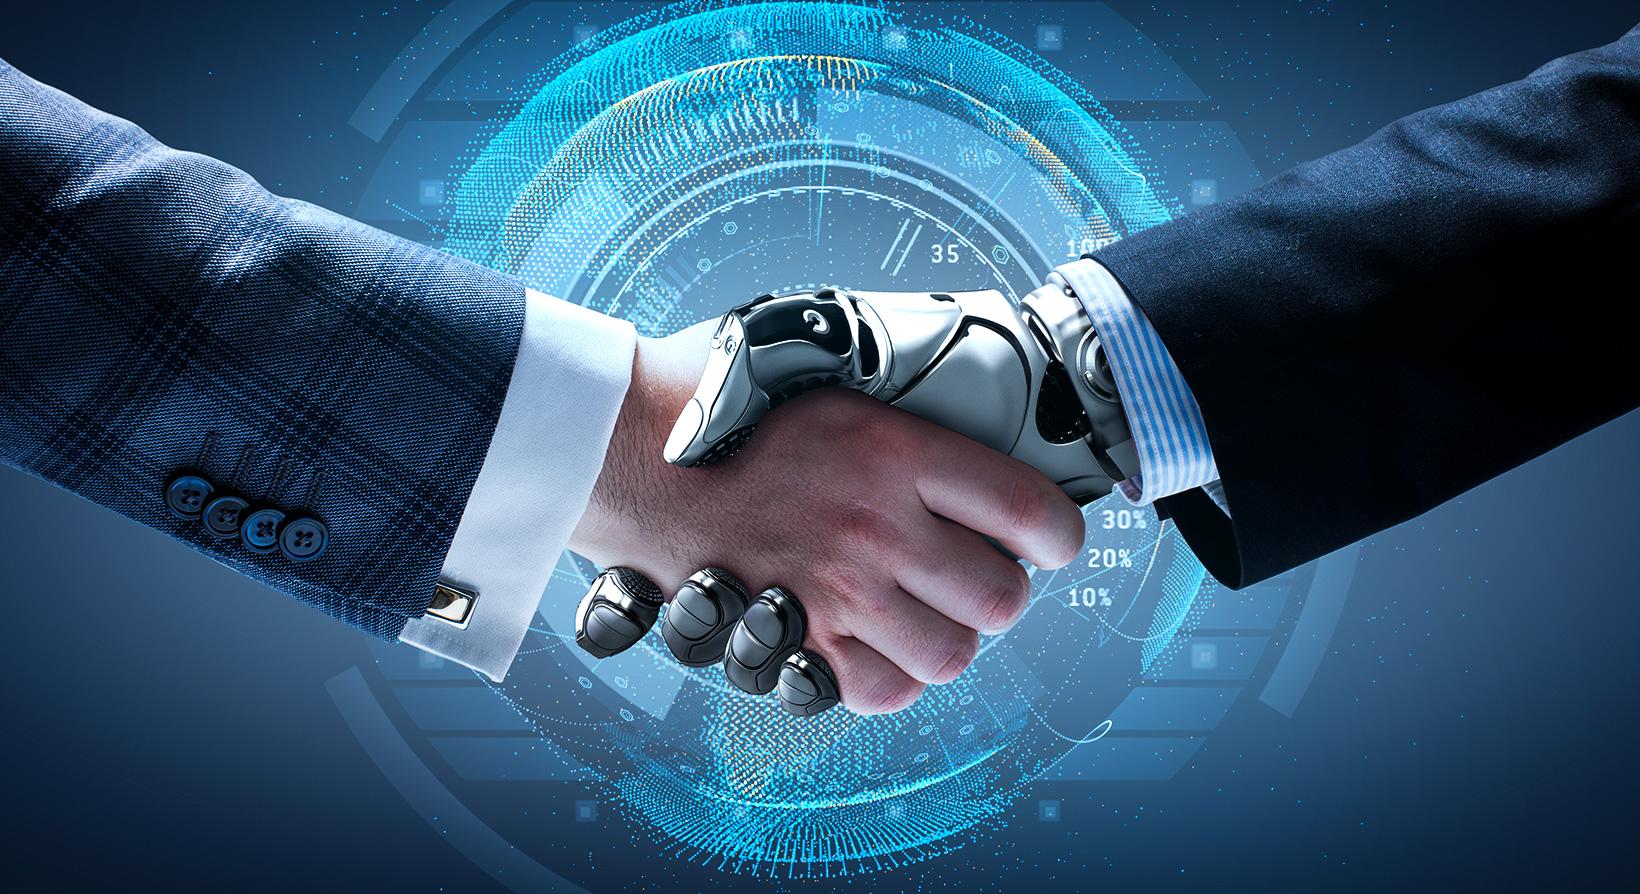 Artificial Intelligence  helps farmers : UN ILO Chief